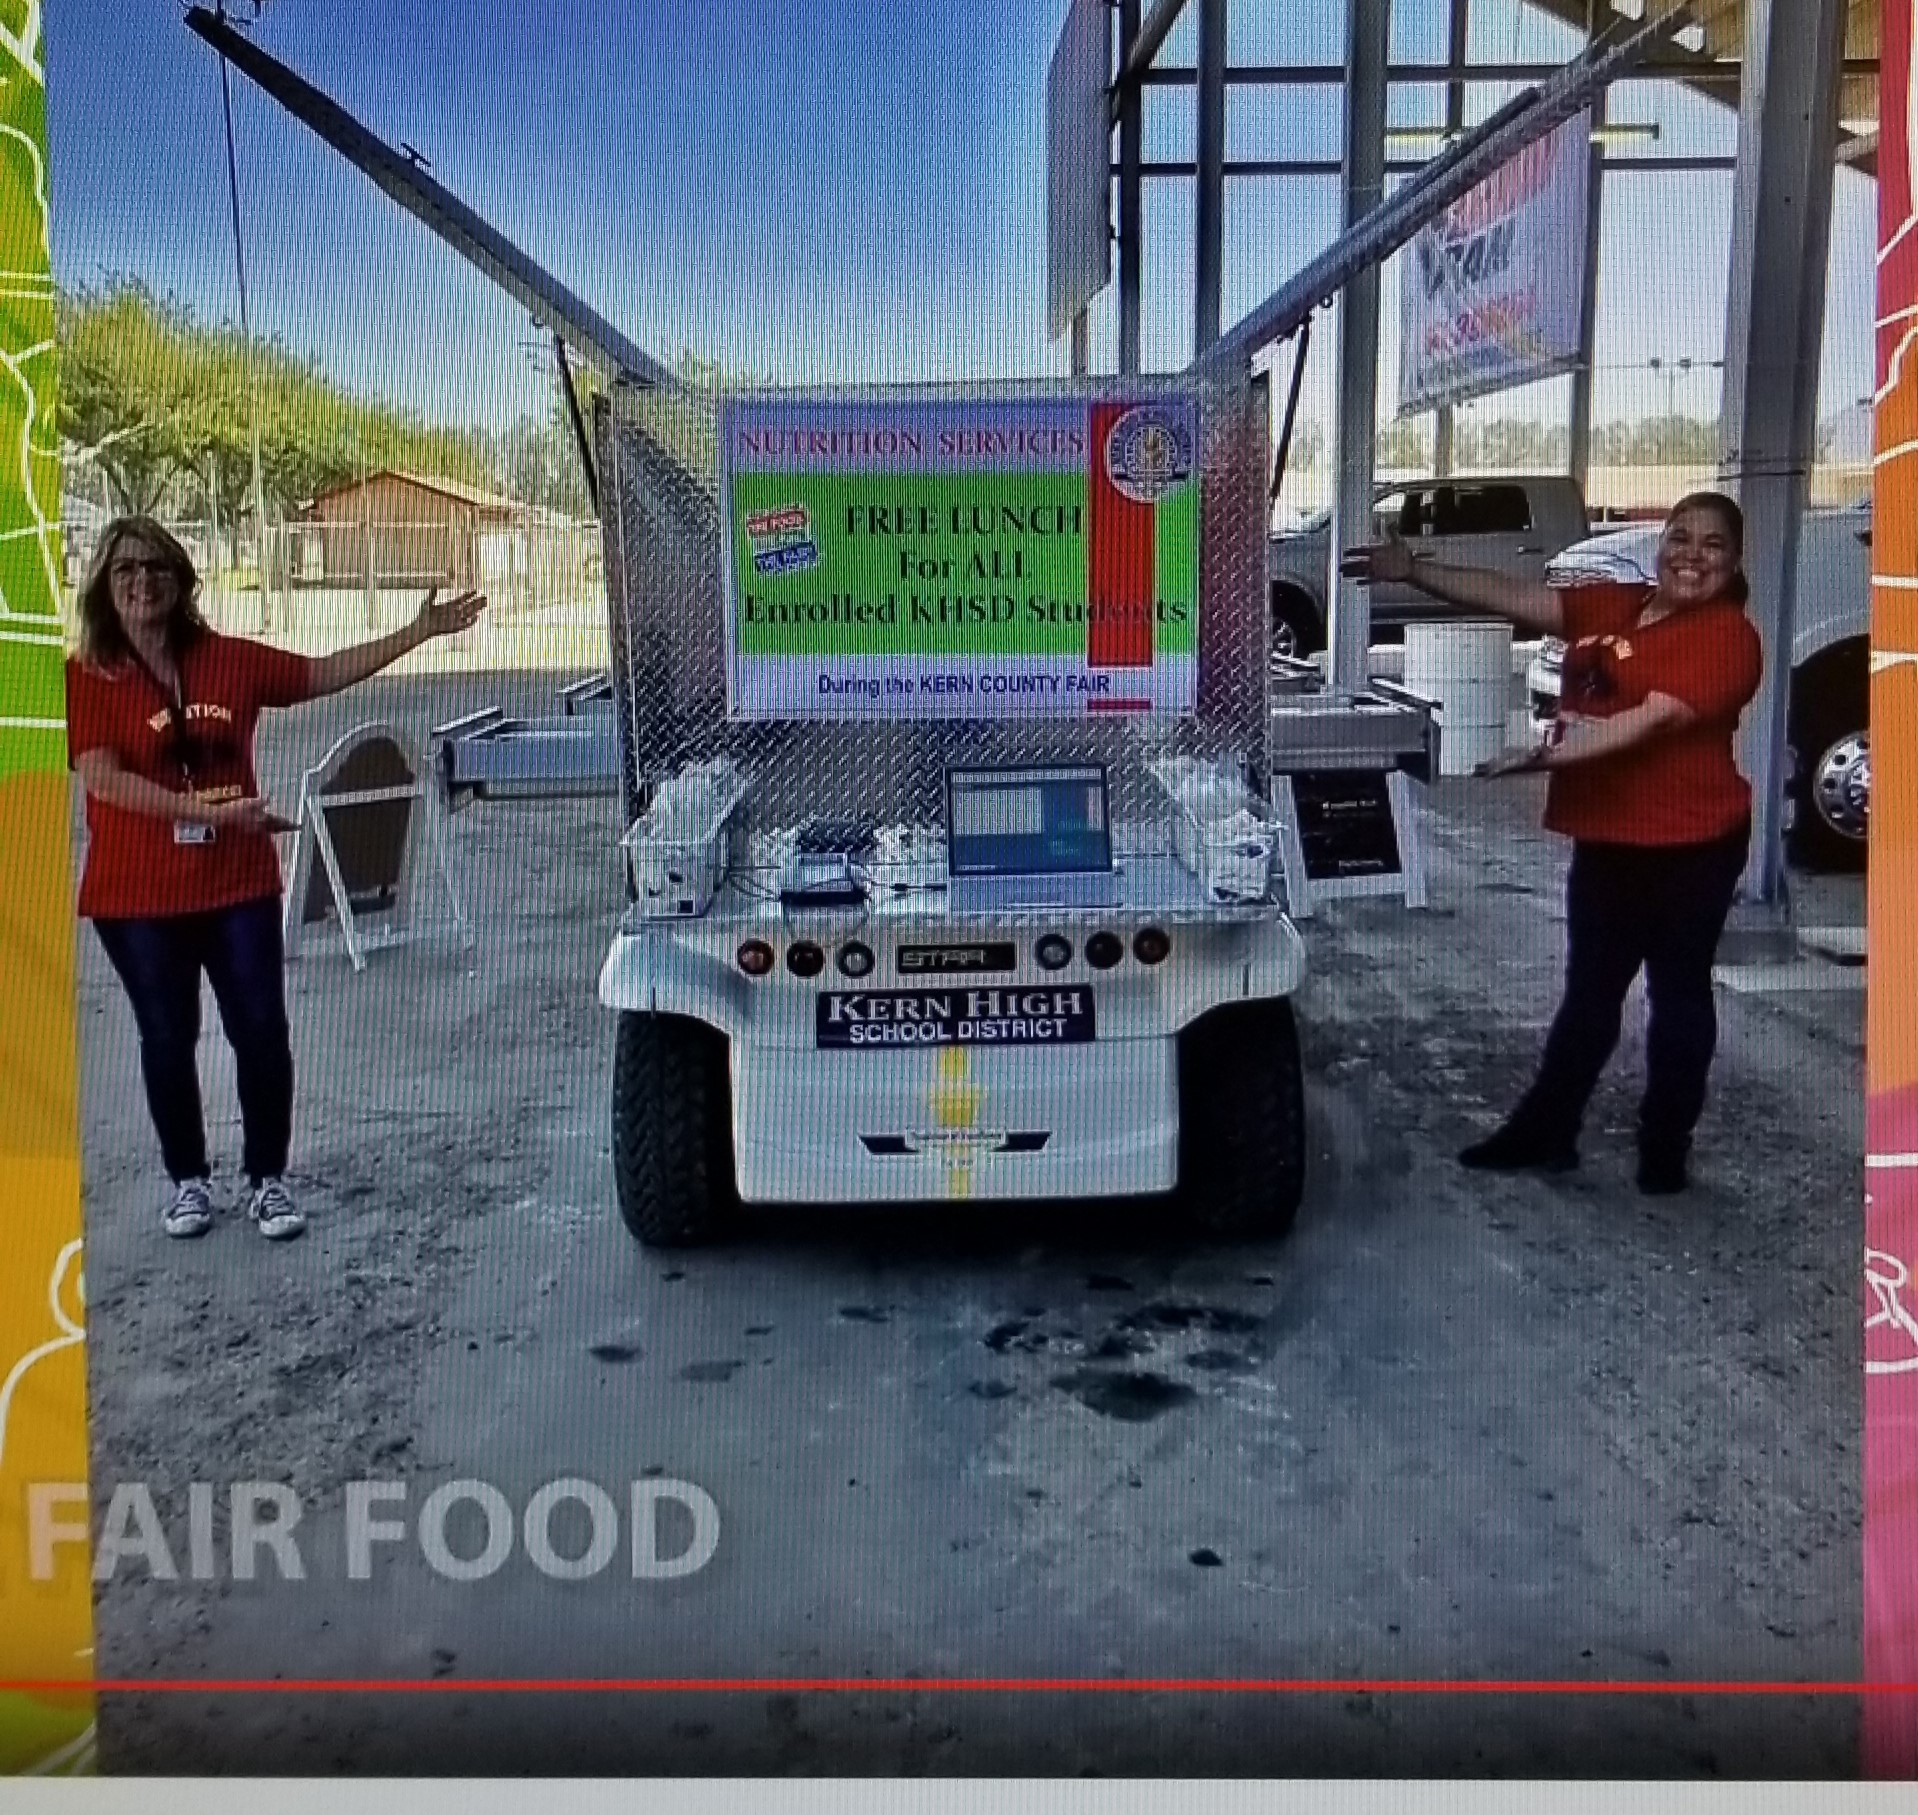 KCFair-FoodCart.jpg